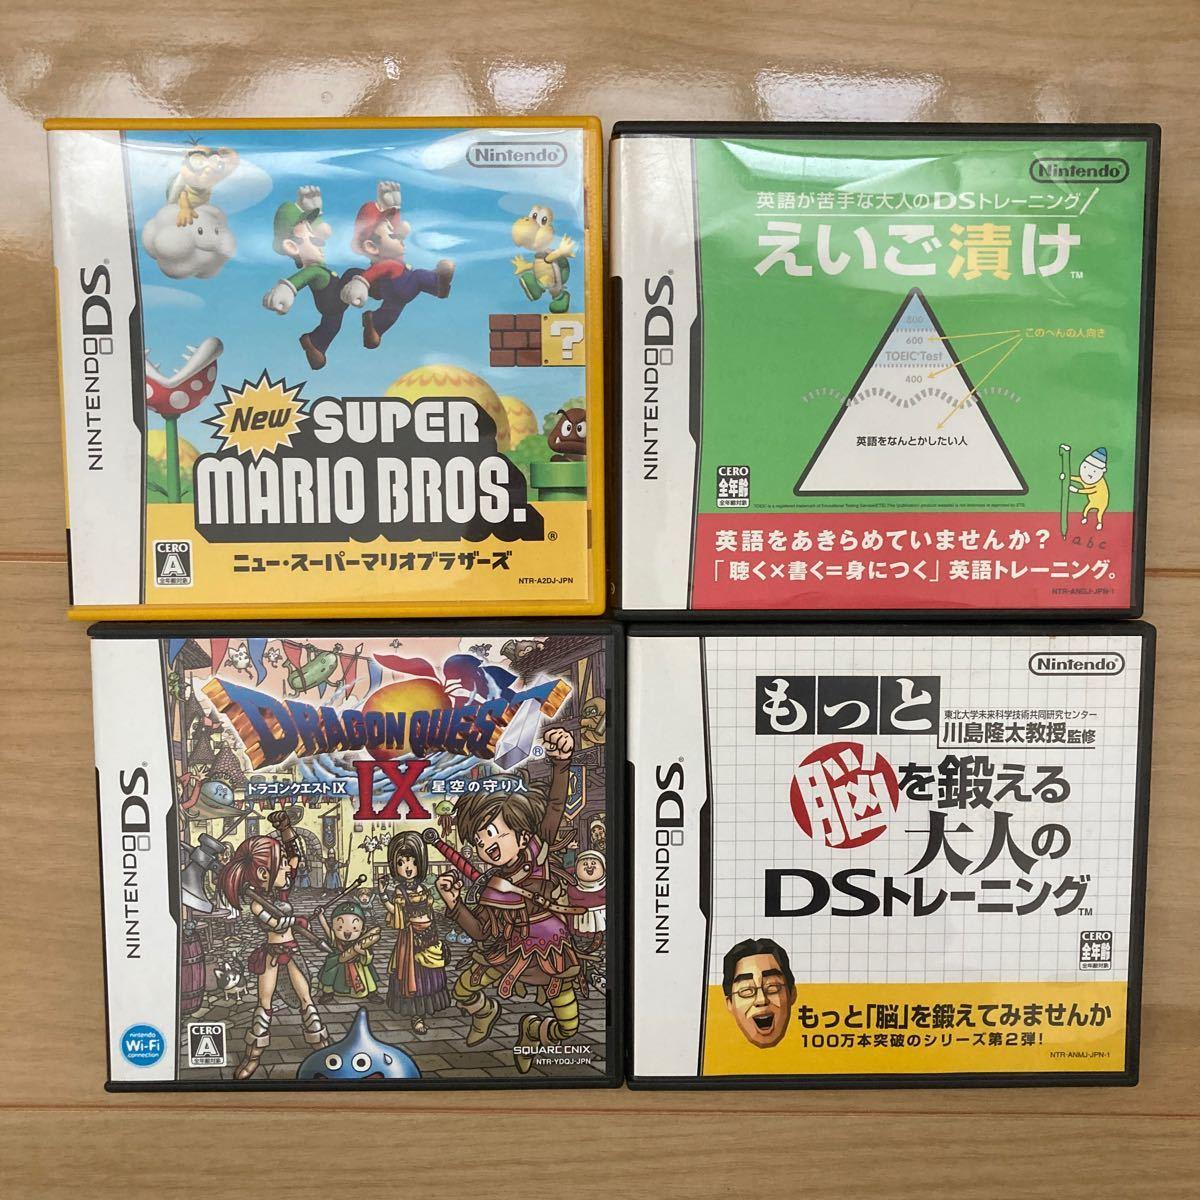 【DS】 ソフト4本 ドラゴンクエスト9.えいご漬け .スーパーマリオブラザーズ、脳を鍛える大人のDSトレーニング